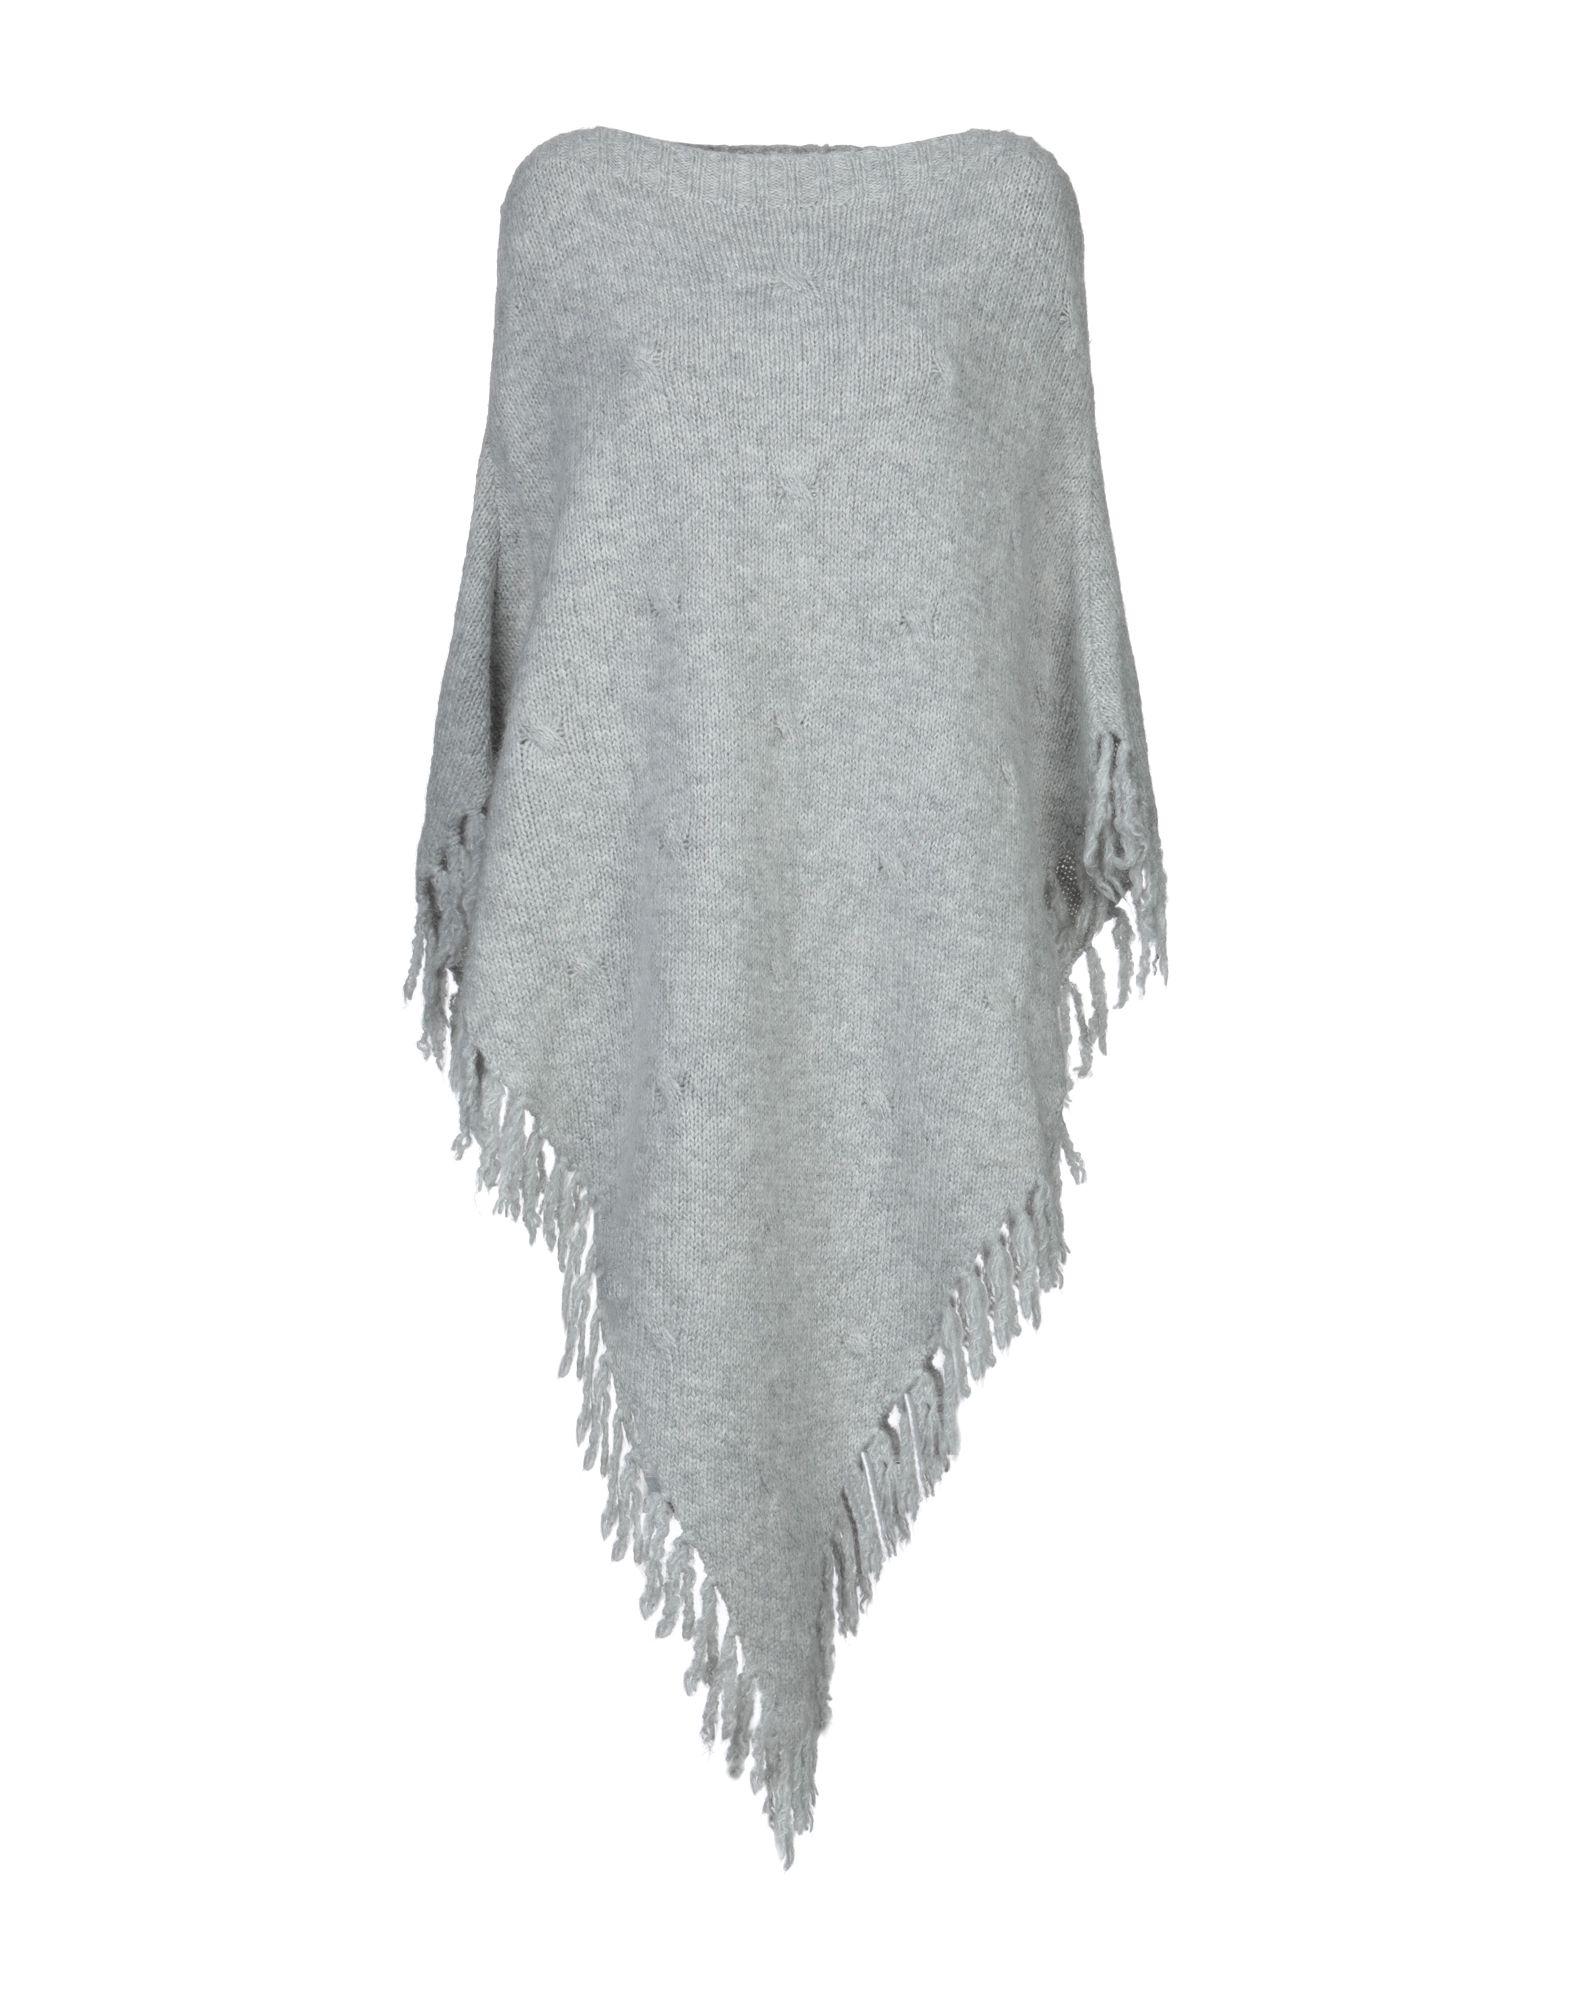 emily fullerton wraps, capes & ponchos scarves for women - Buy best